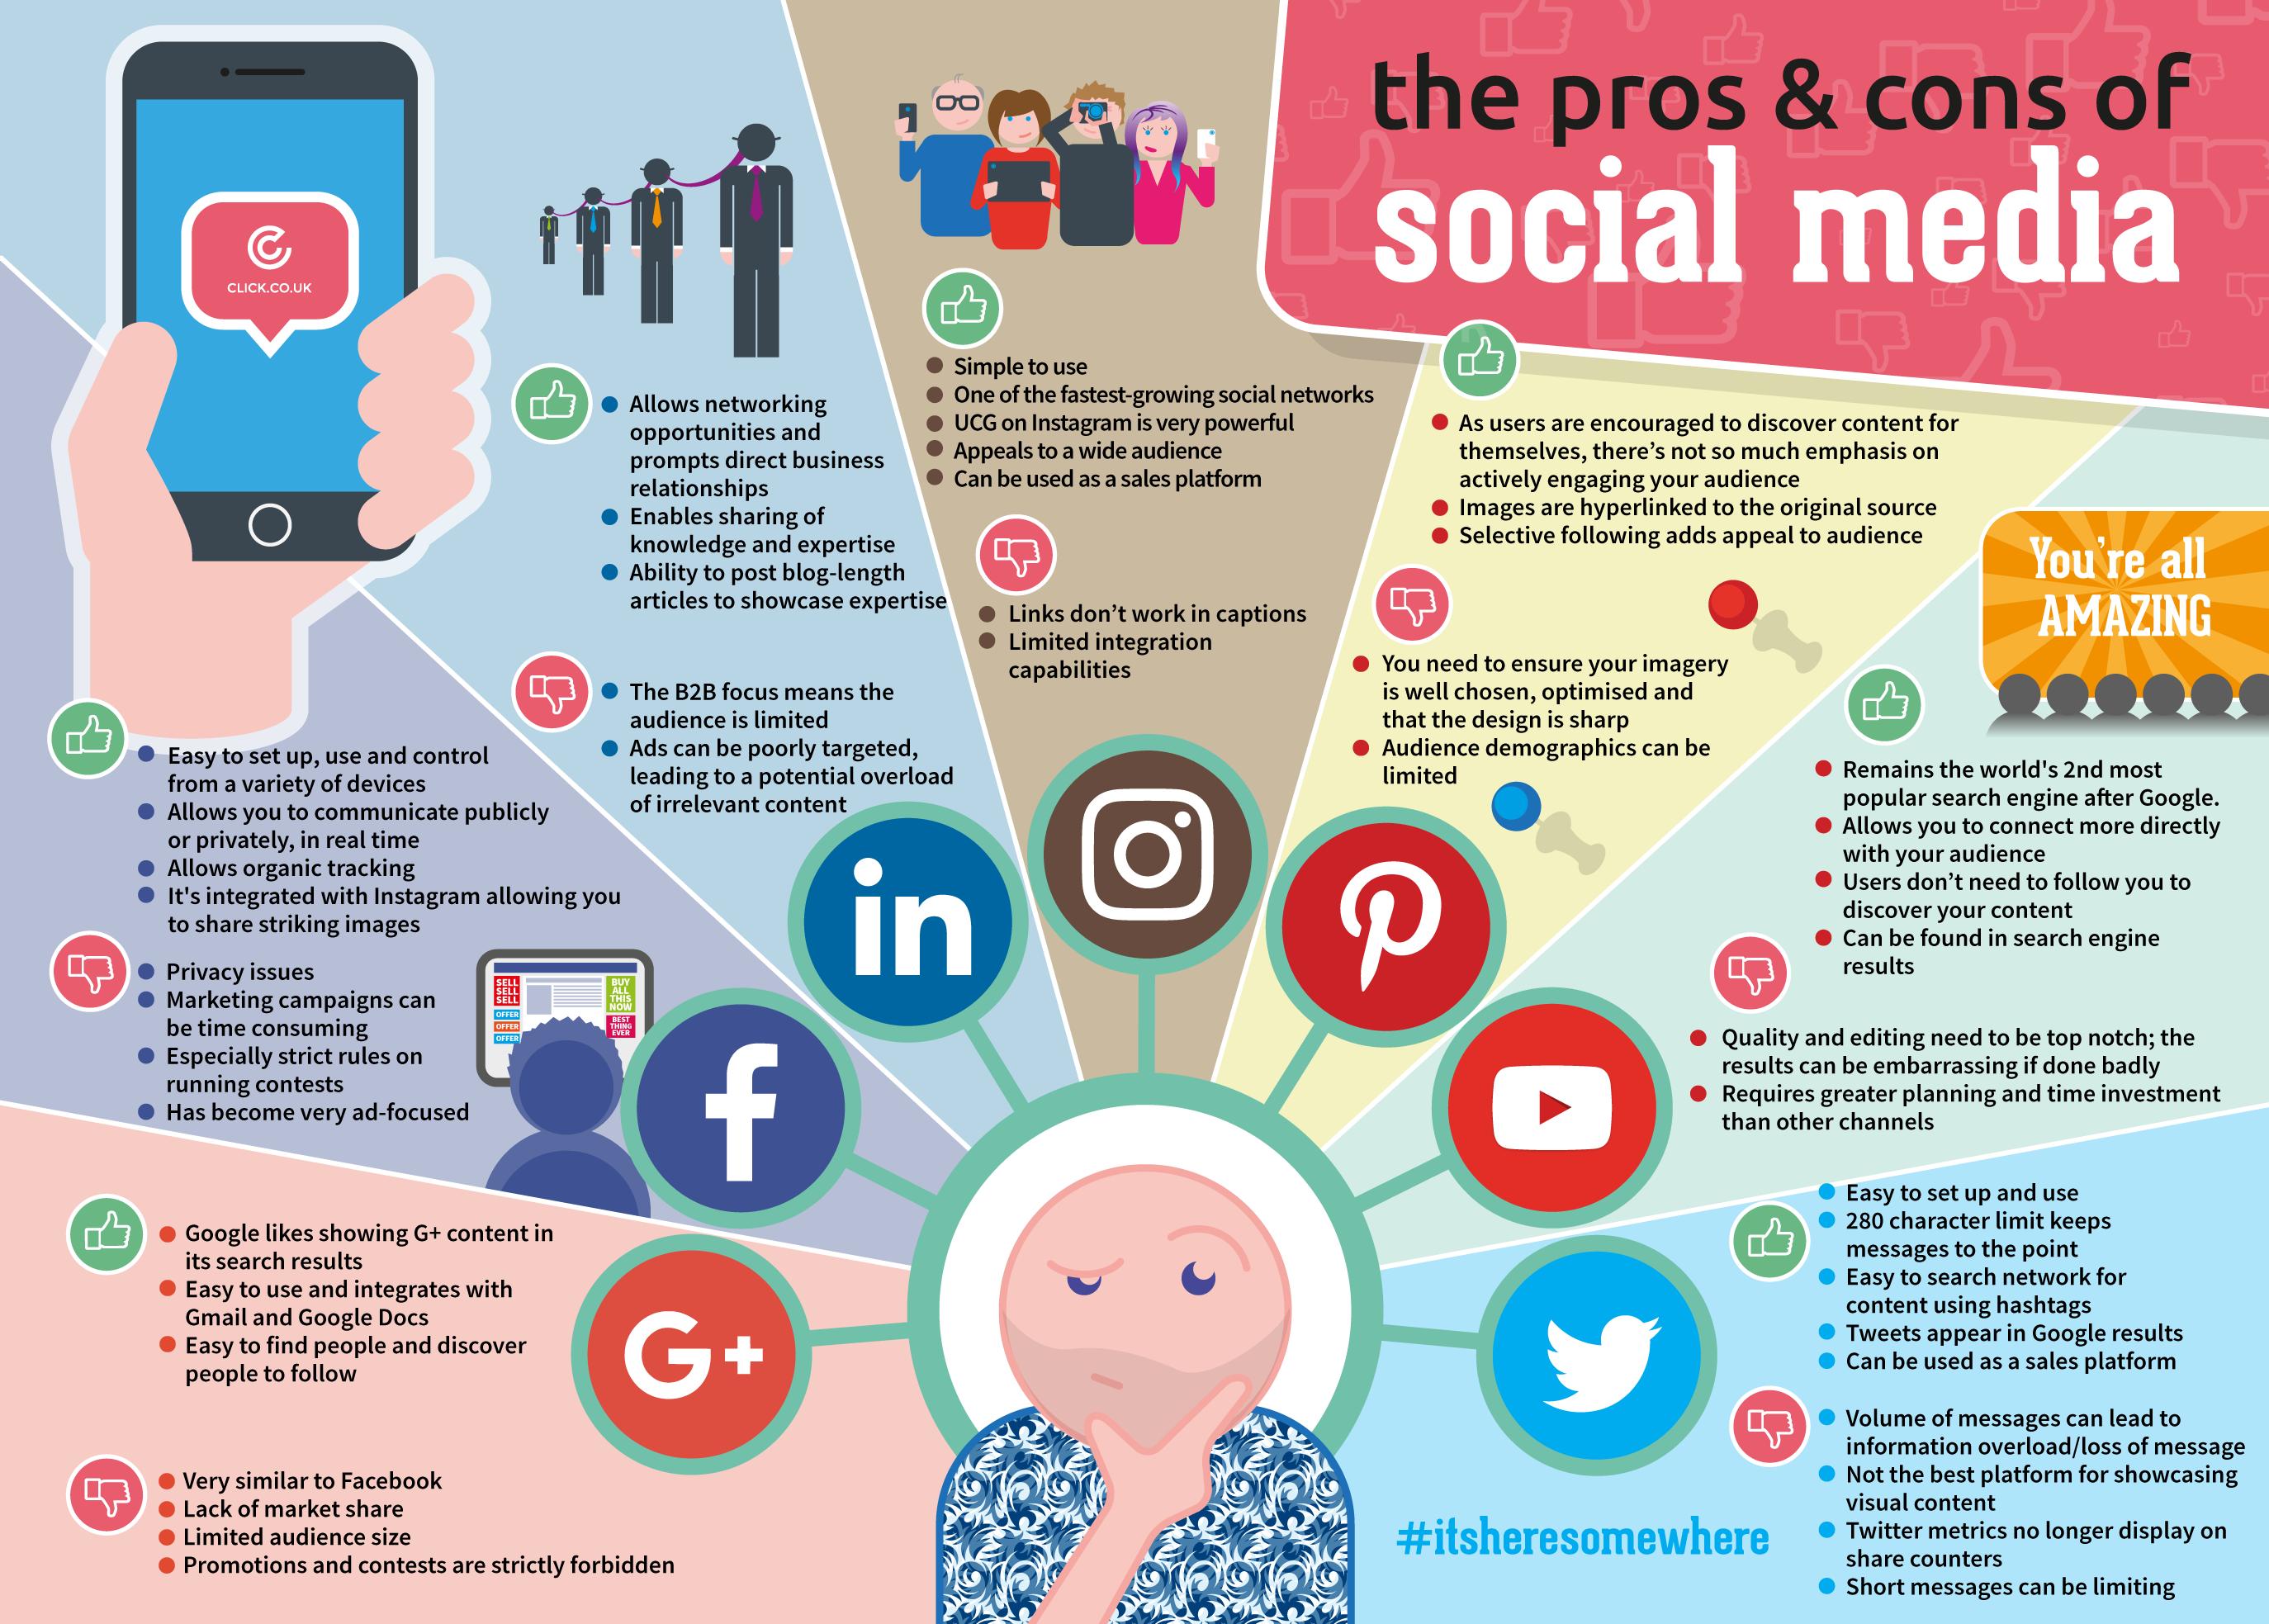 Social-media-pros-cons-2017-2 (1)